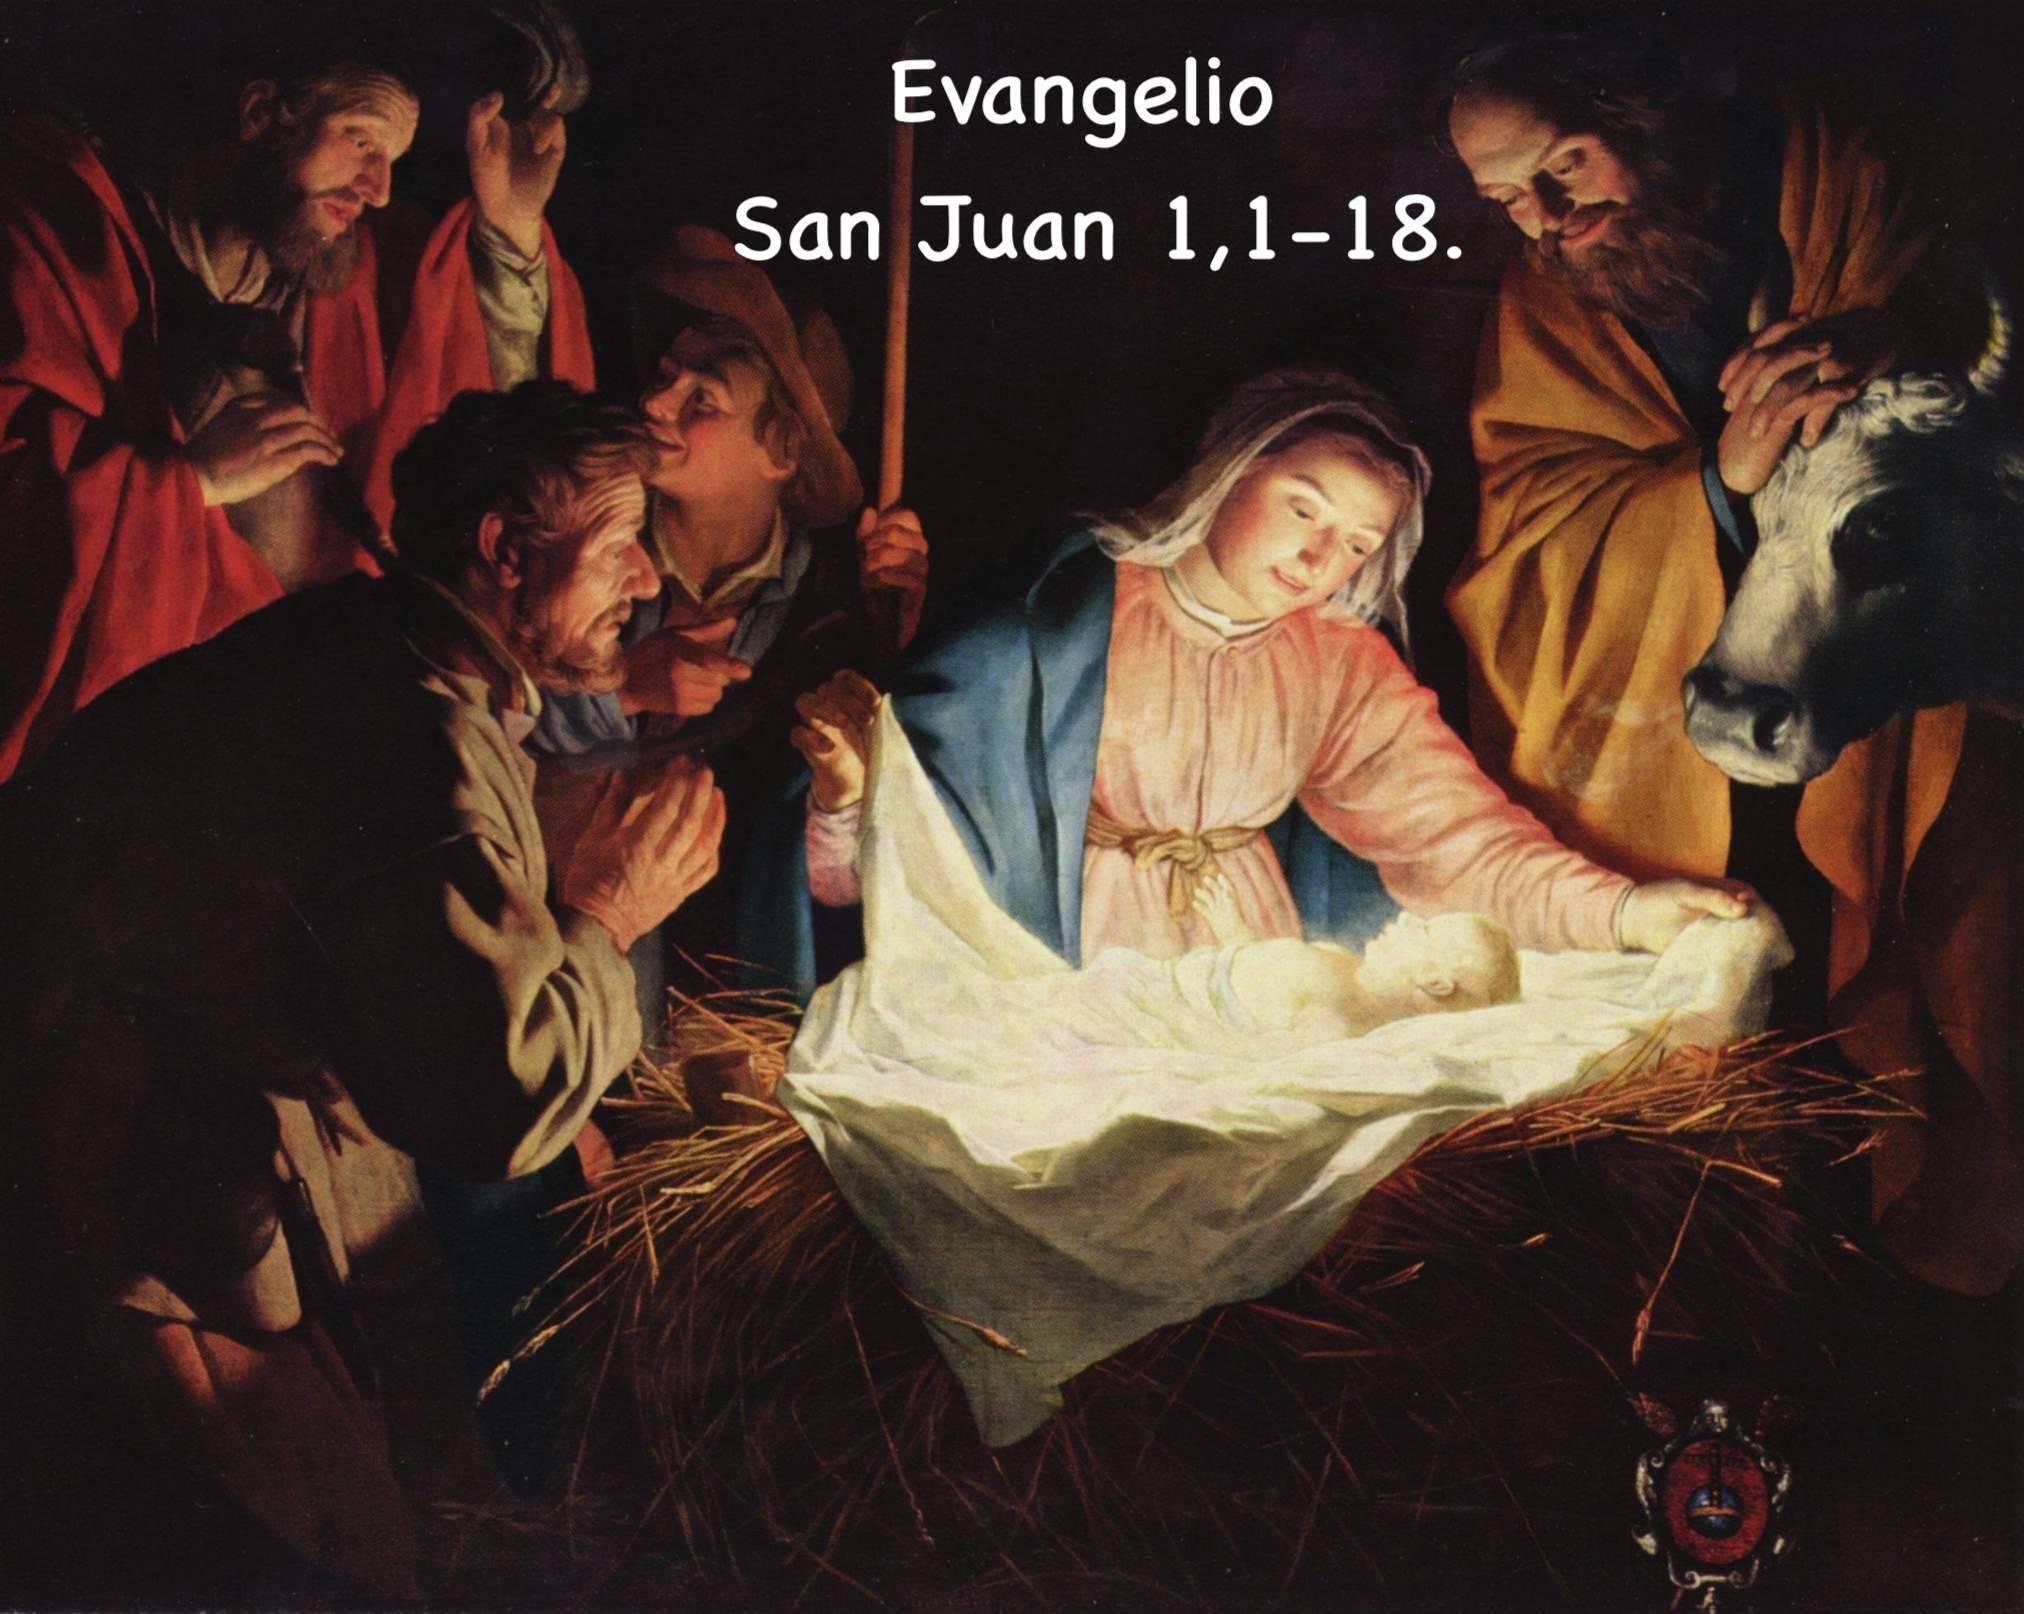 Evangelio según San Juan 1,1-18.